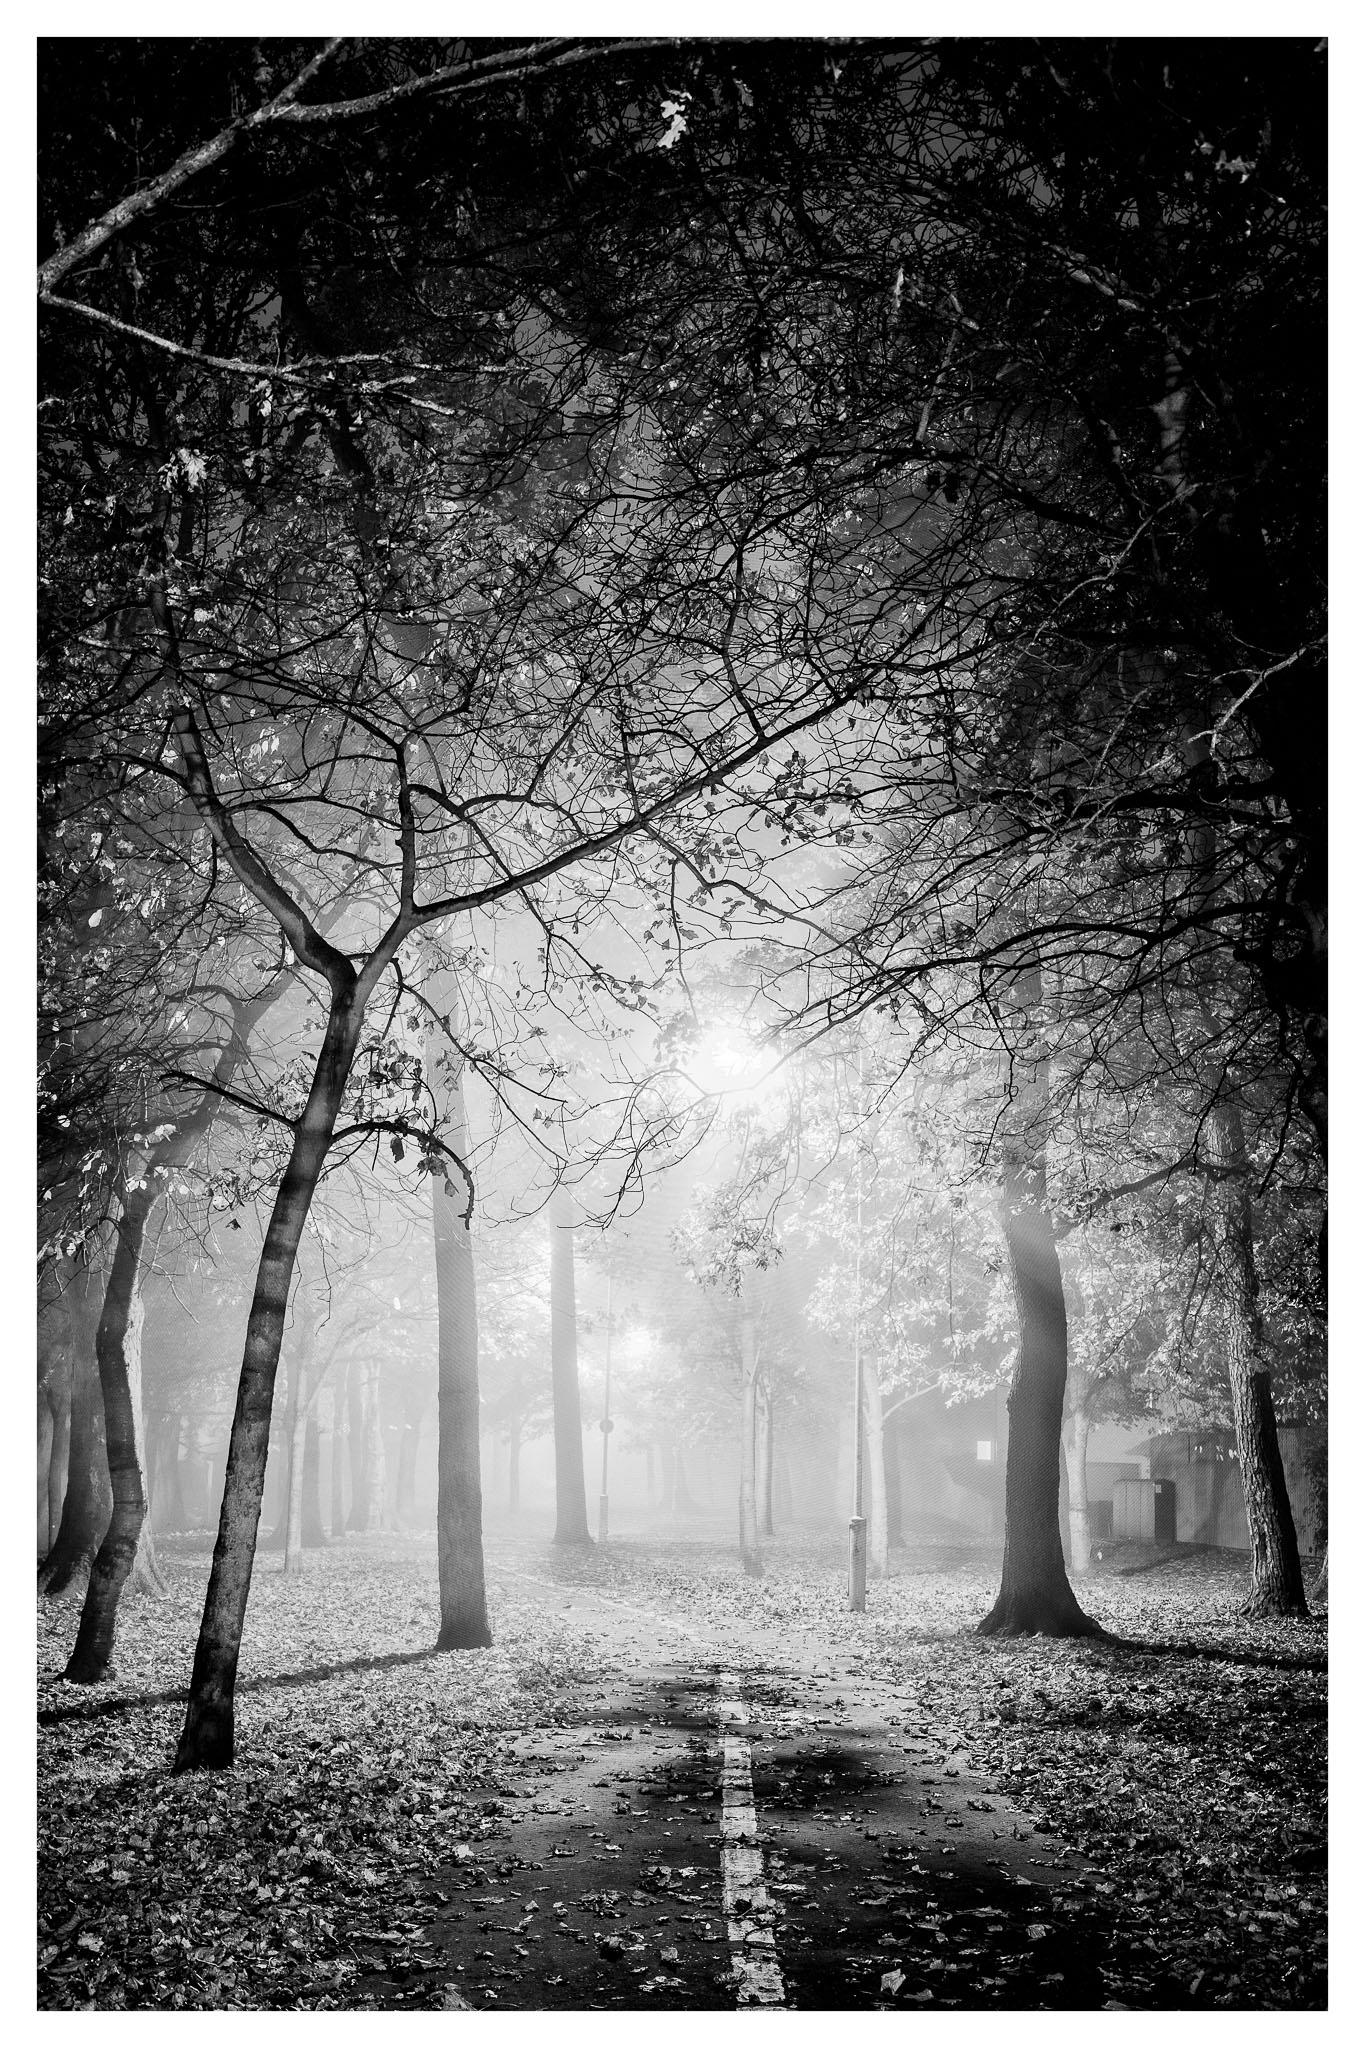 D71_1951-Edit.jpg